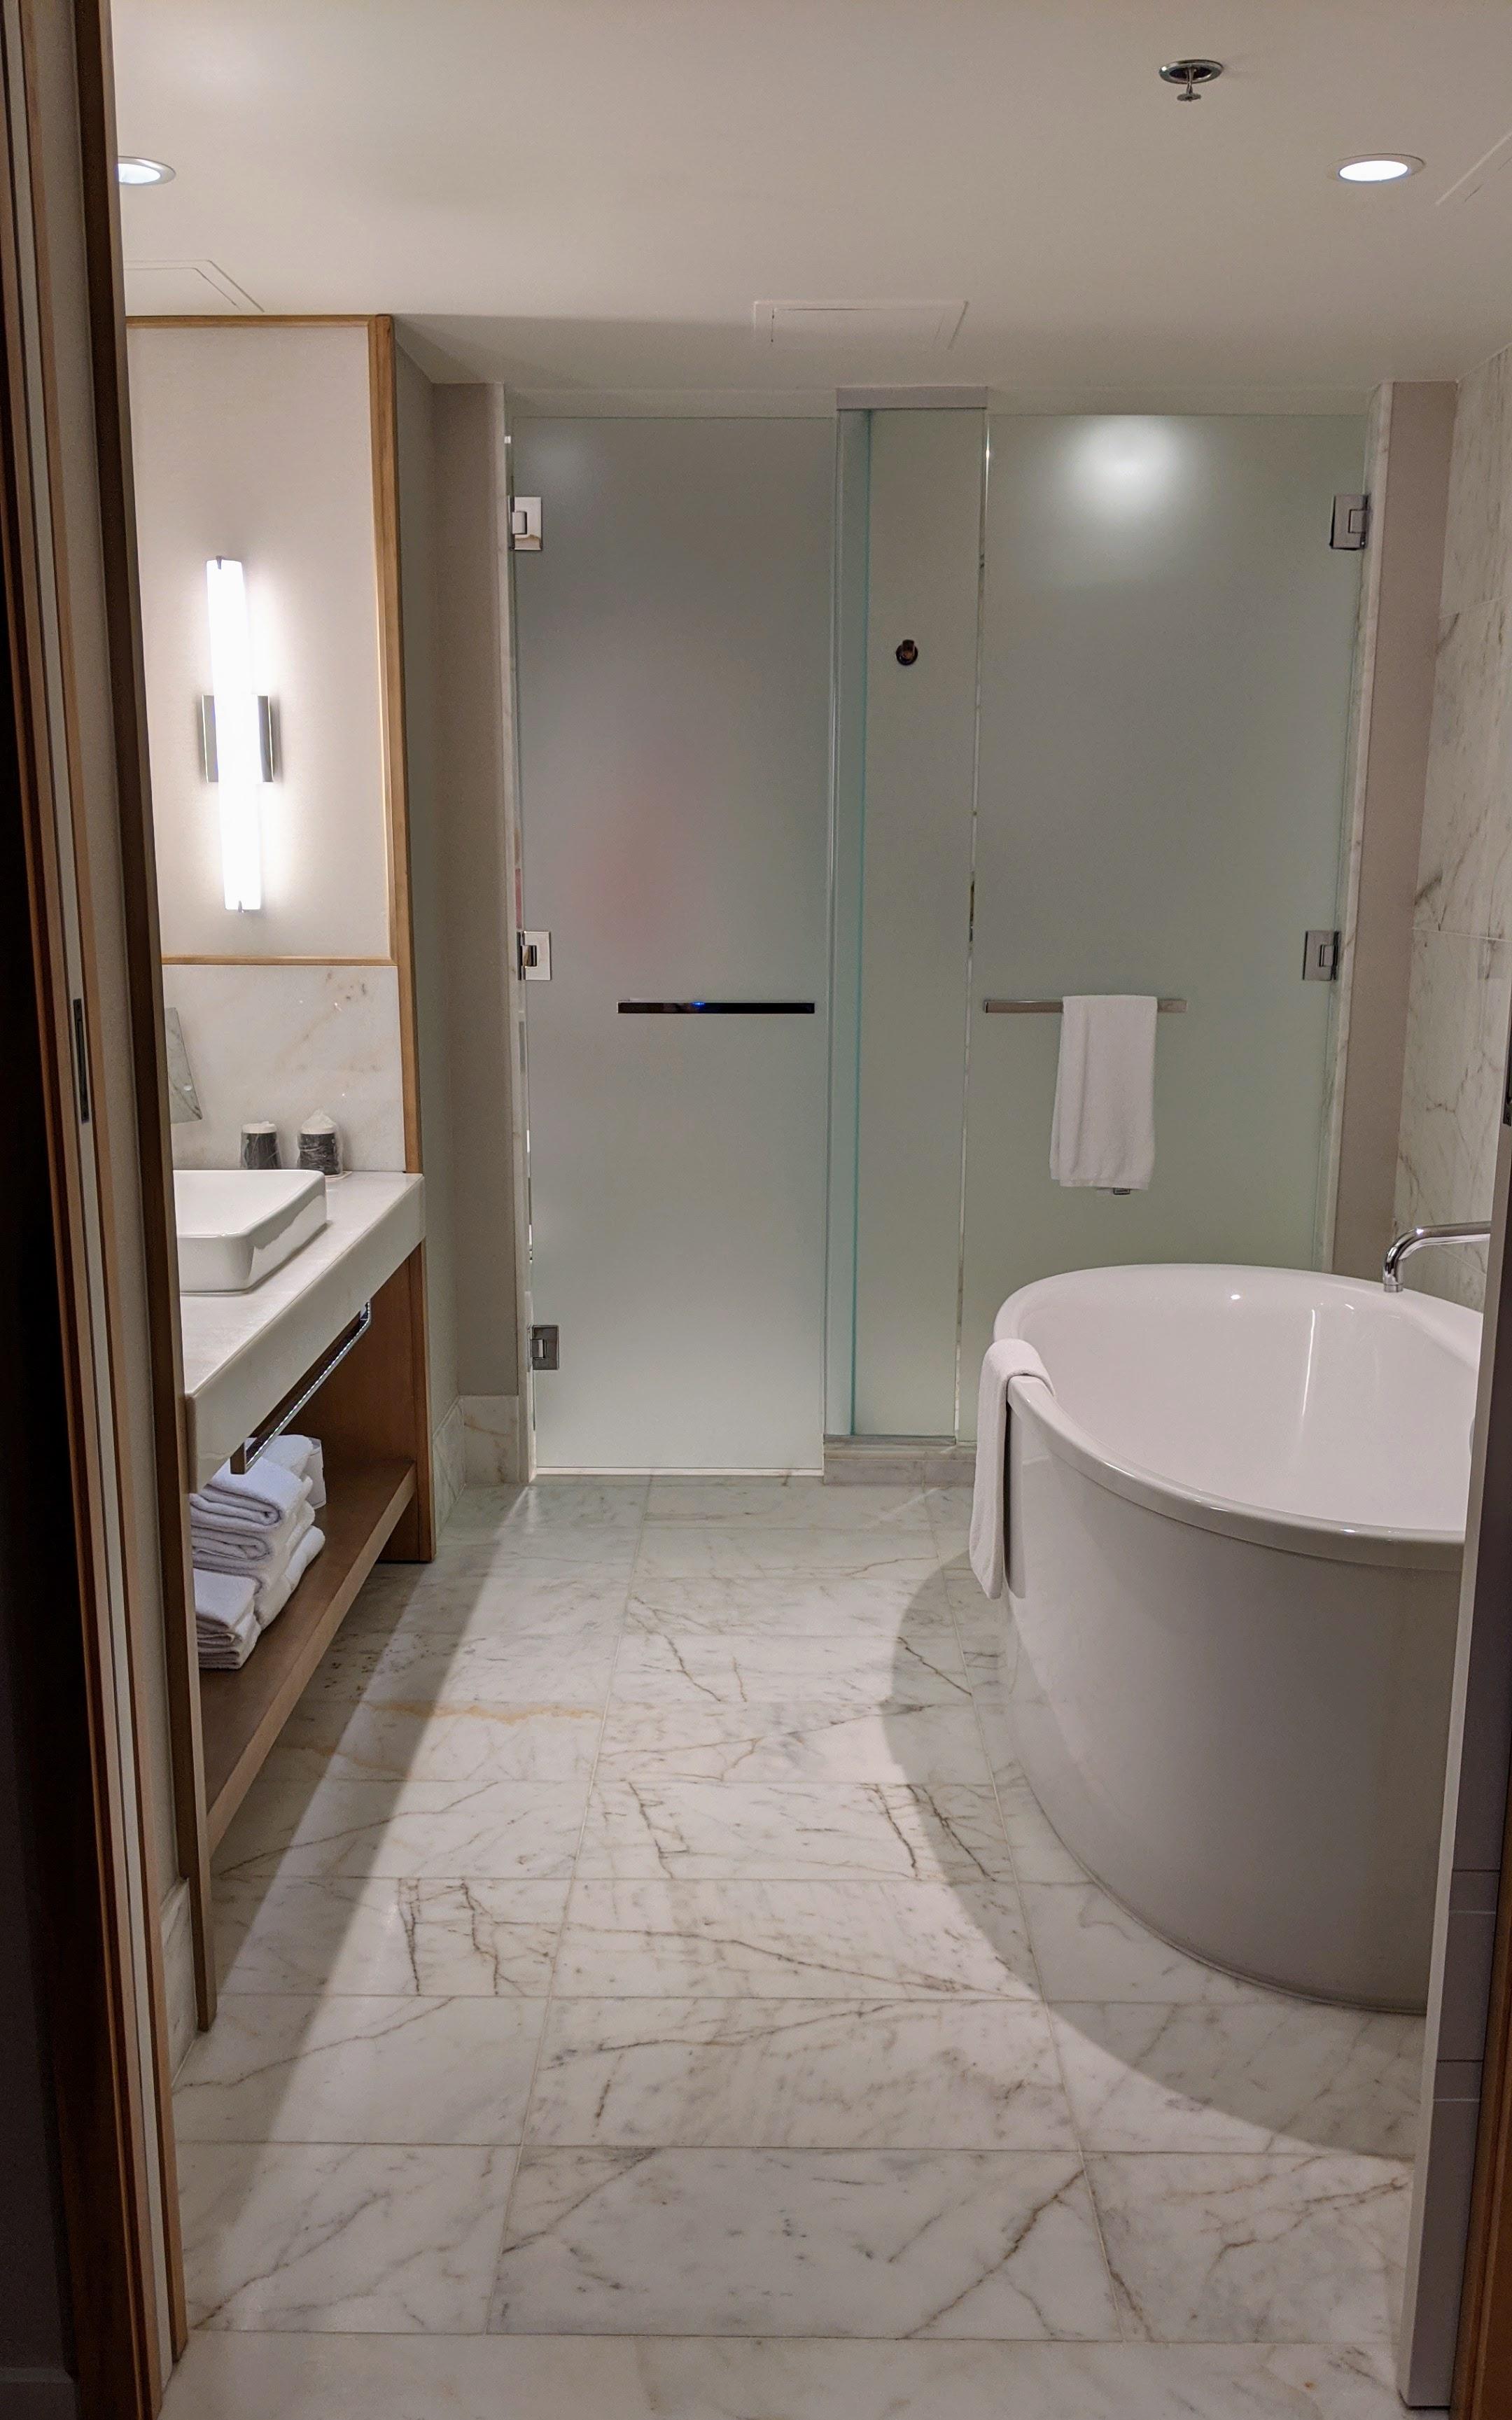 JW Marriott Parq - King Suite